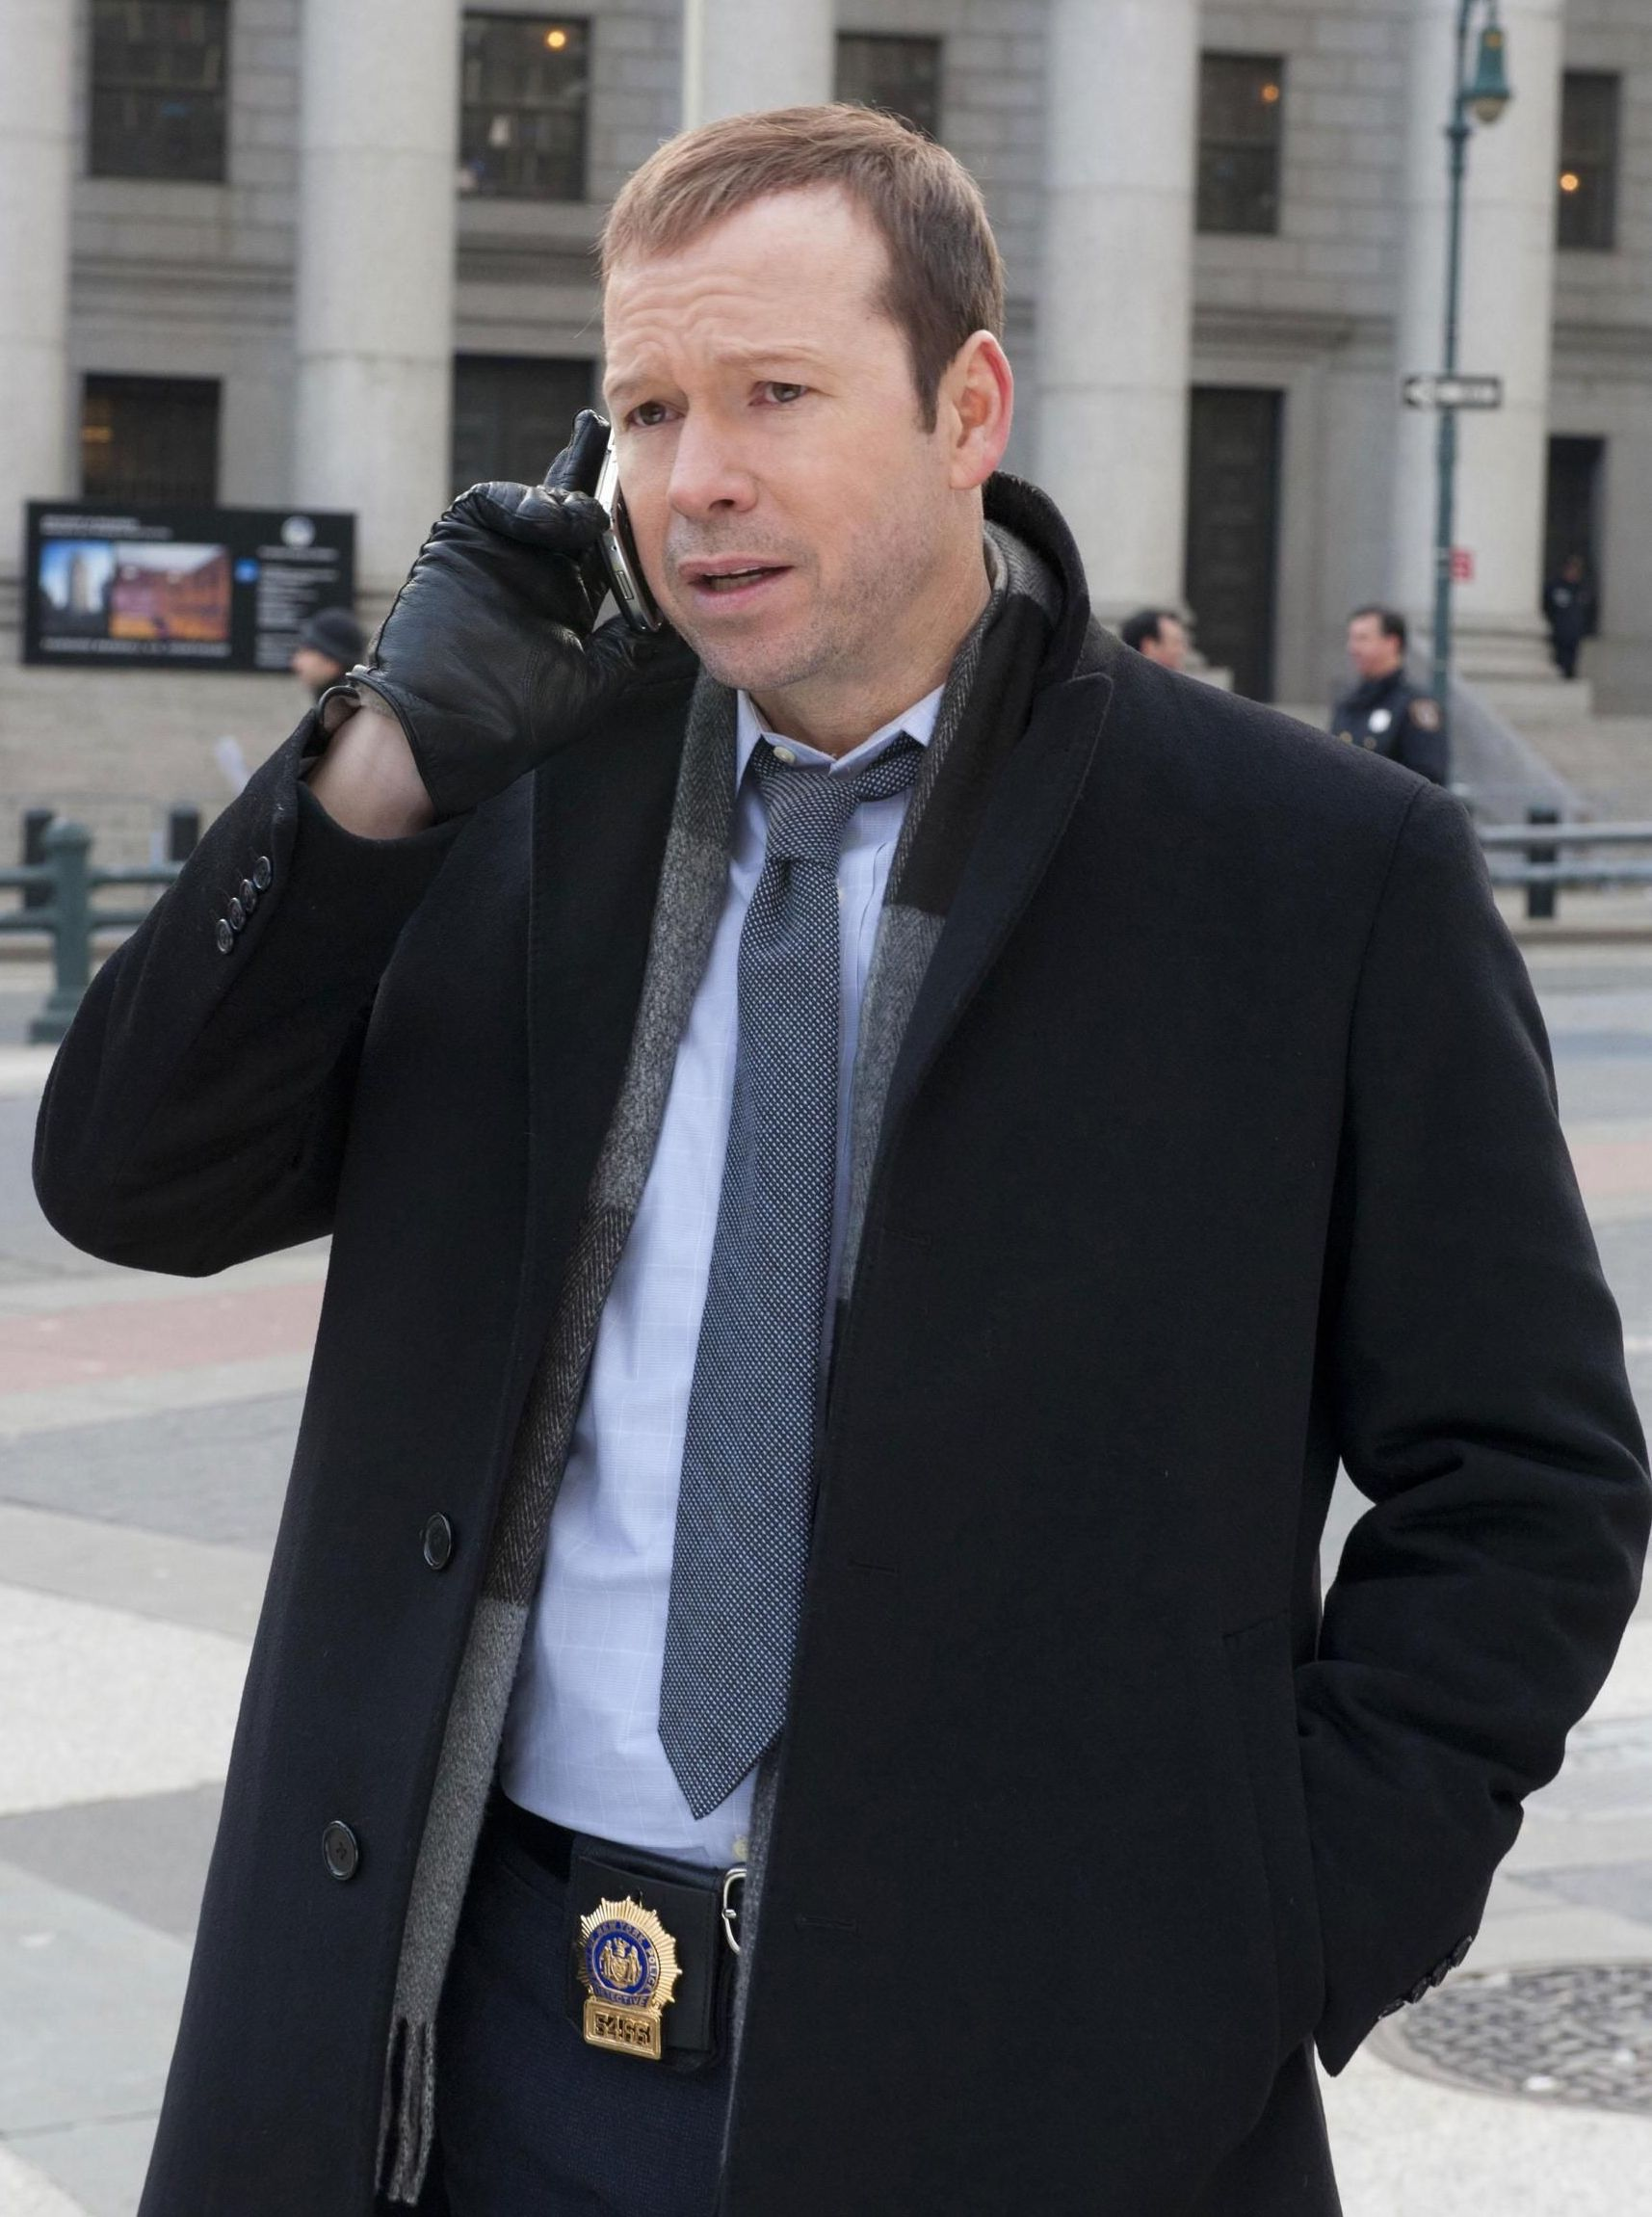 Donnie Wahlberg as Daniel Reagan in Blue Bloods